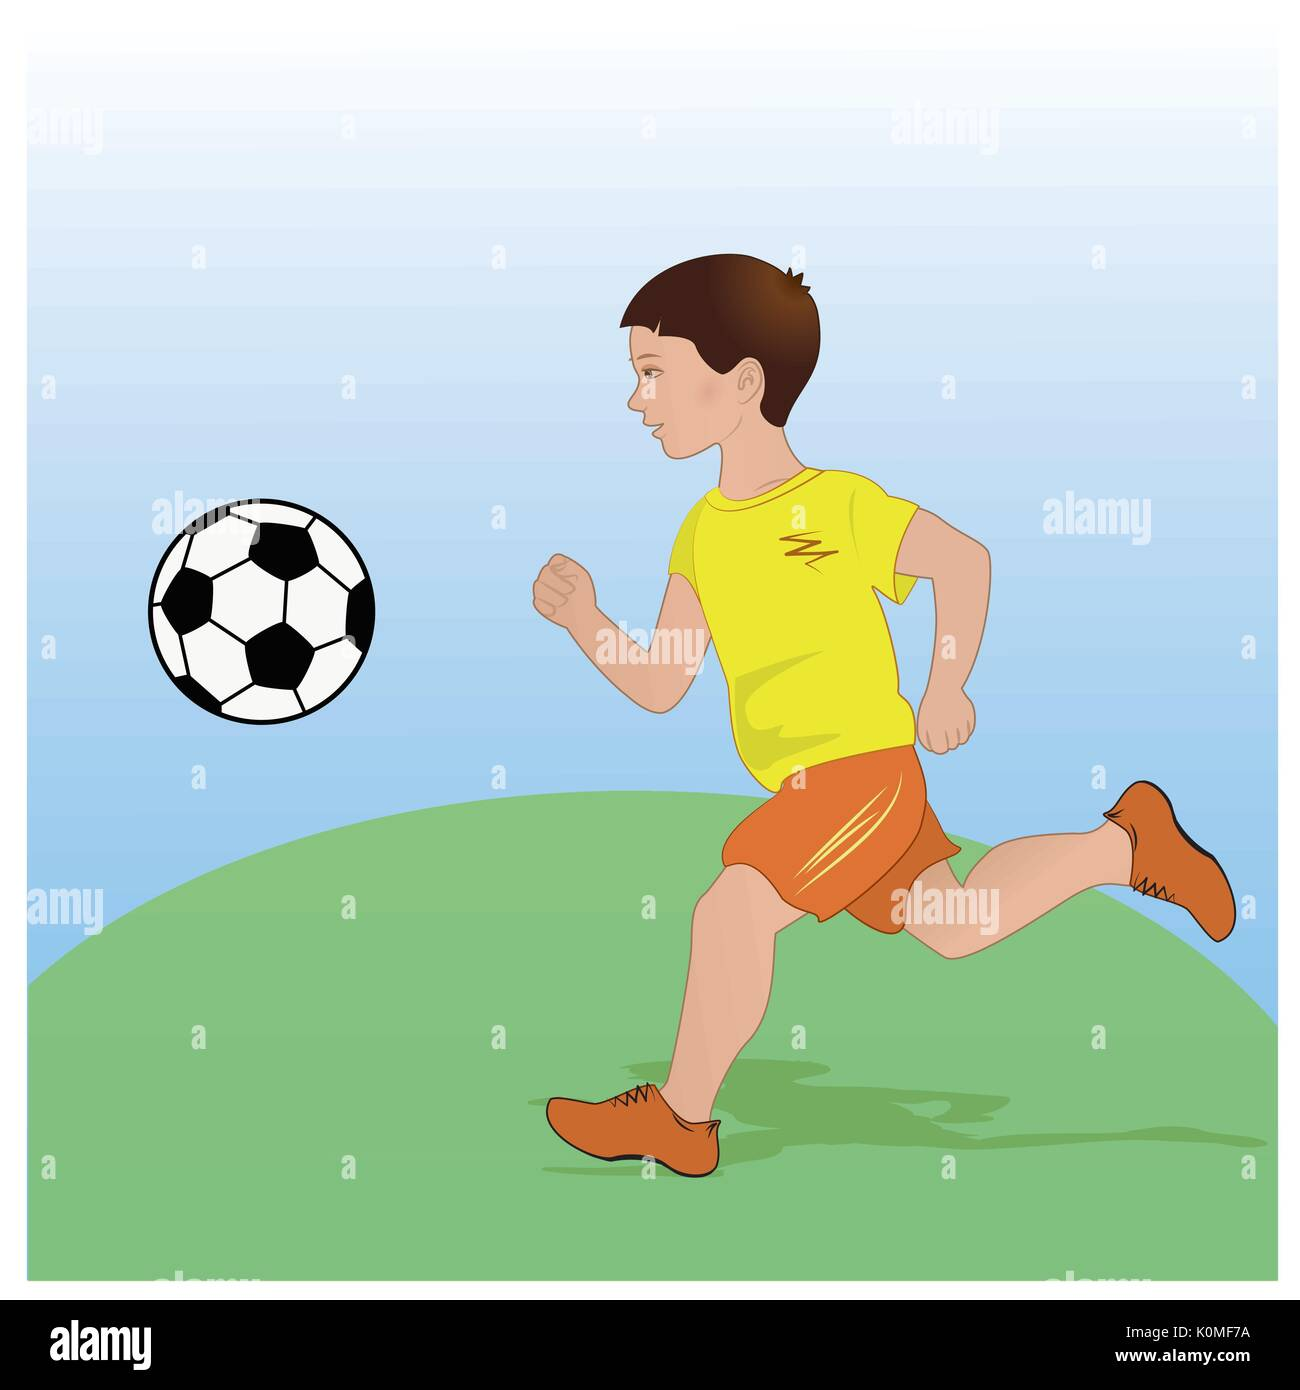 boy playing football. Flat design. - Stock Vector